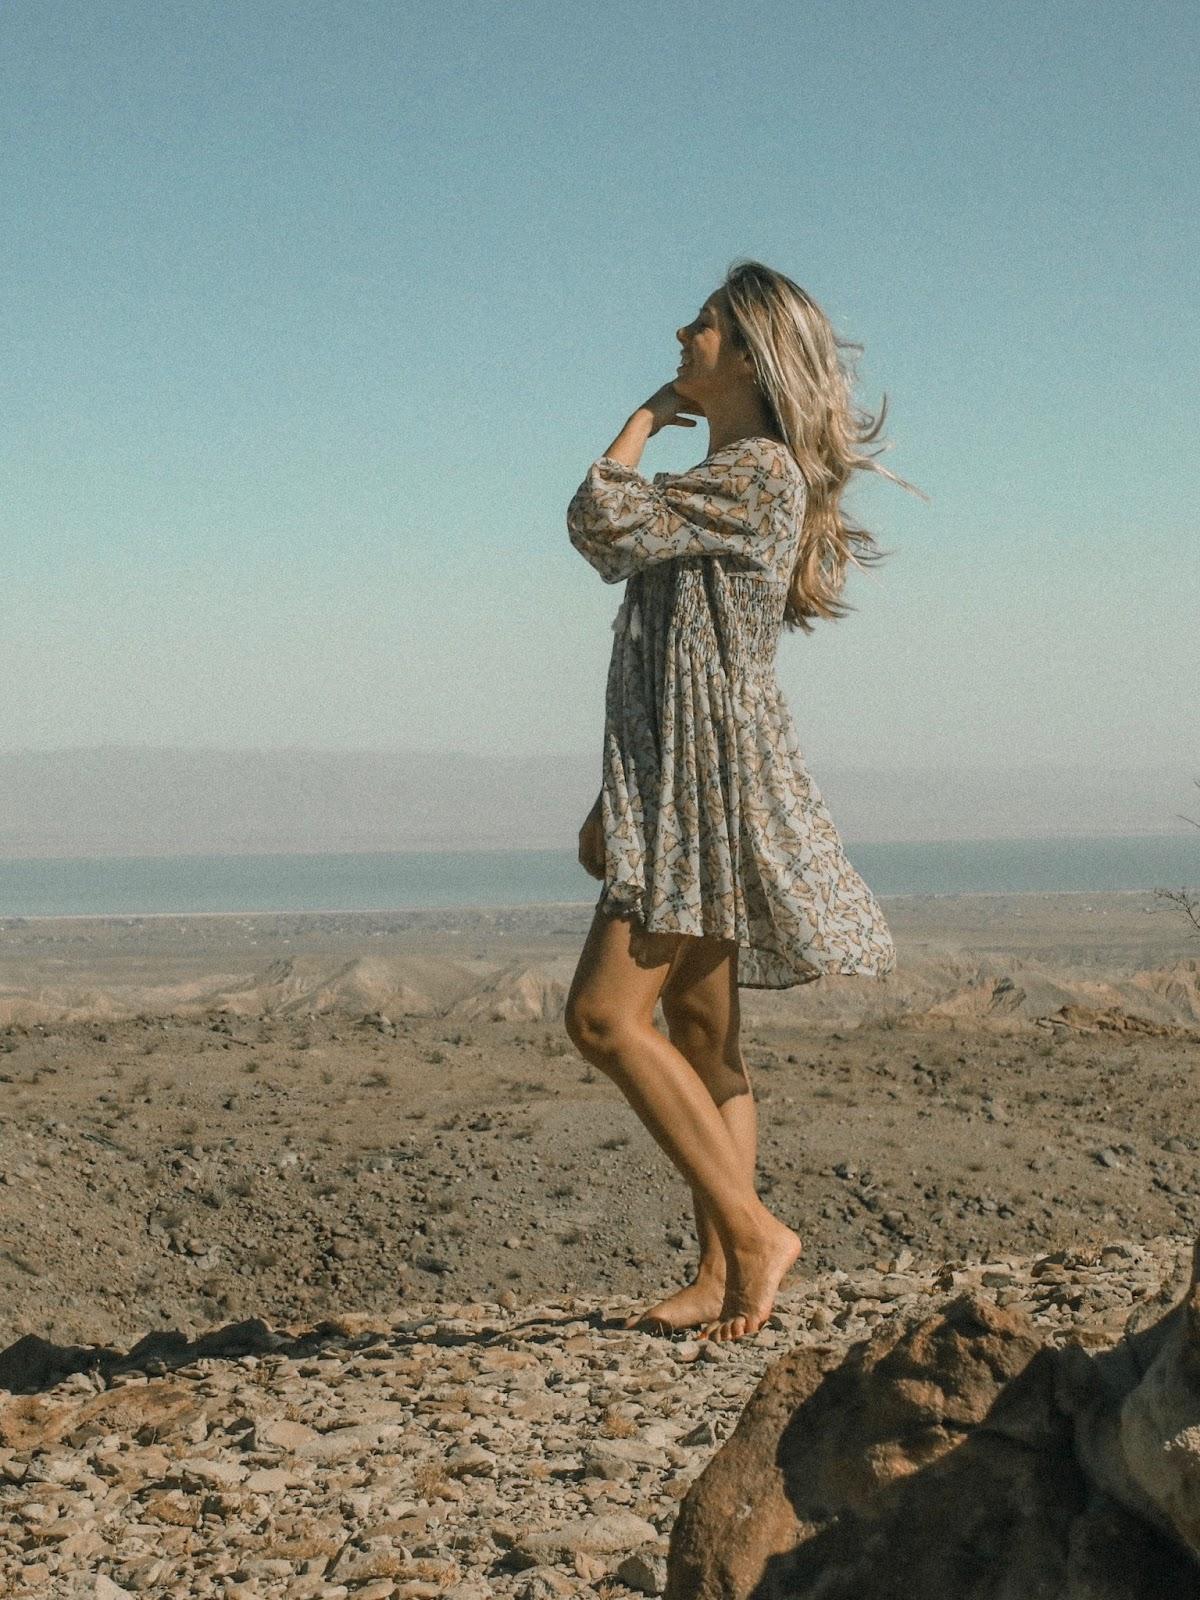 girl dress bohemian look outfit desert